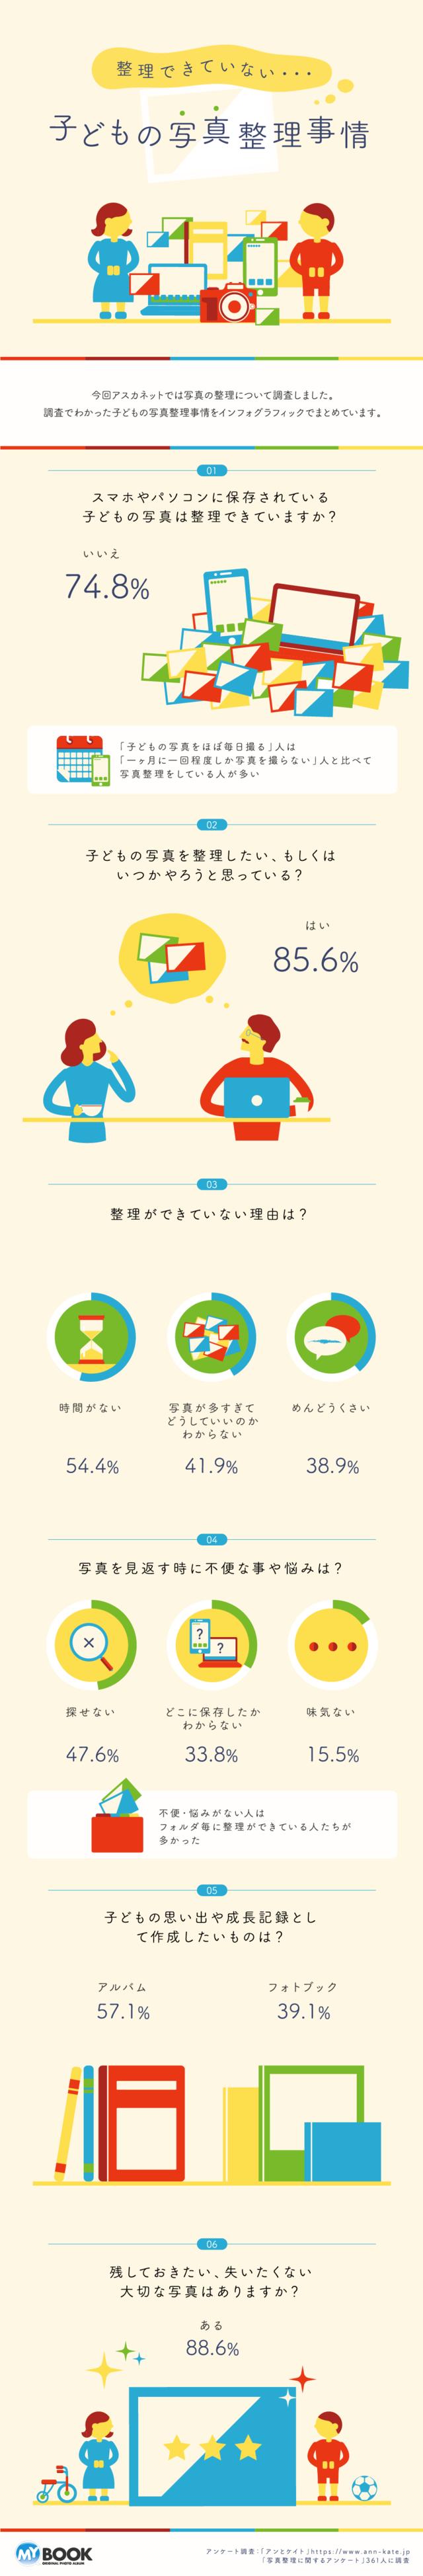 170227 %e5%86%99%e7%9c%9f%e6%95%b4%e7%90%86 cs5 ol